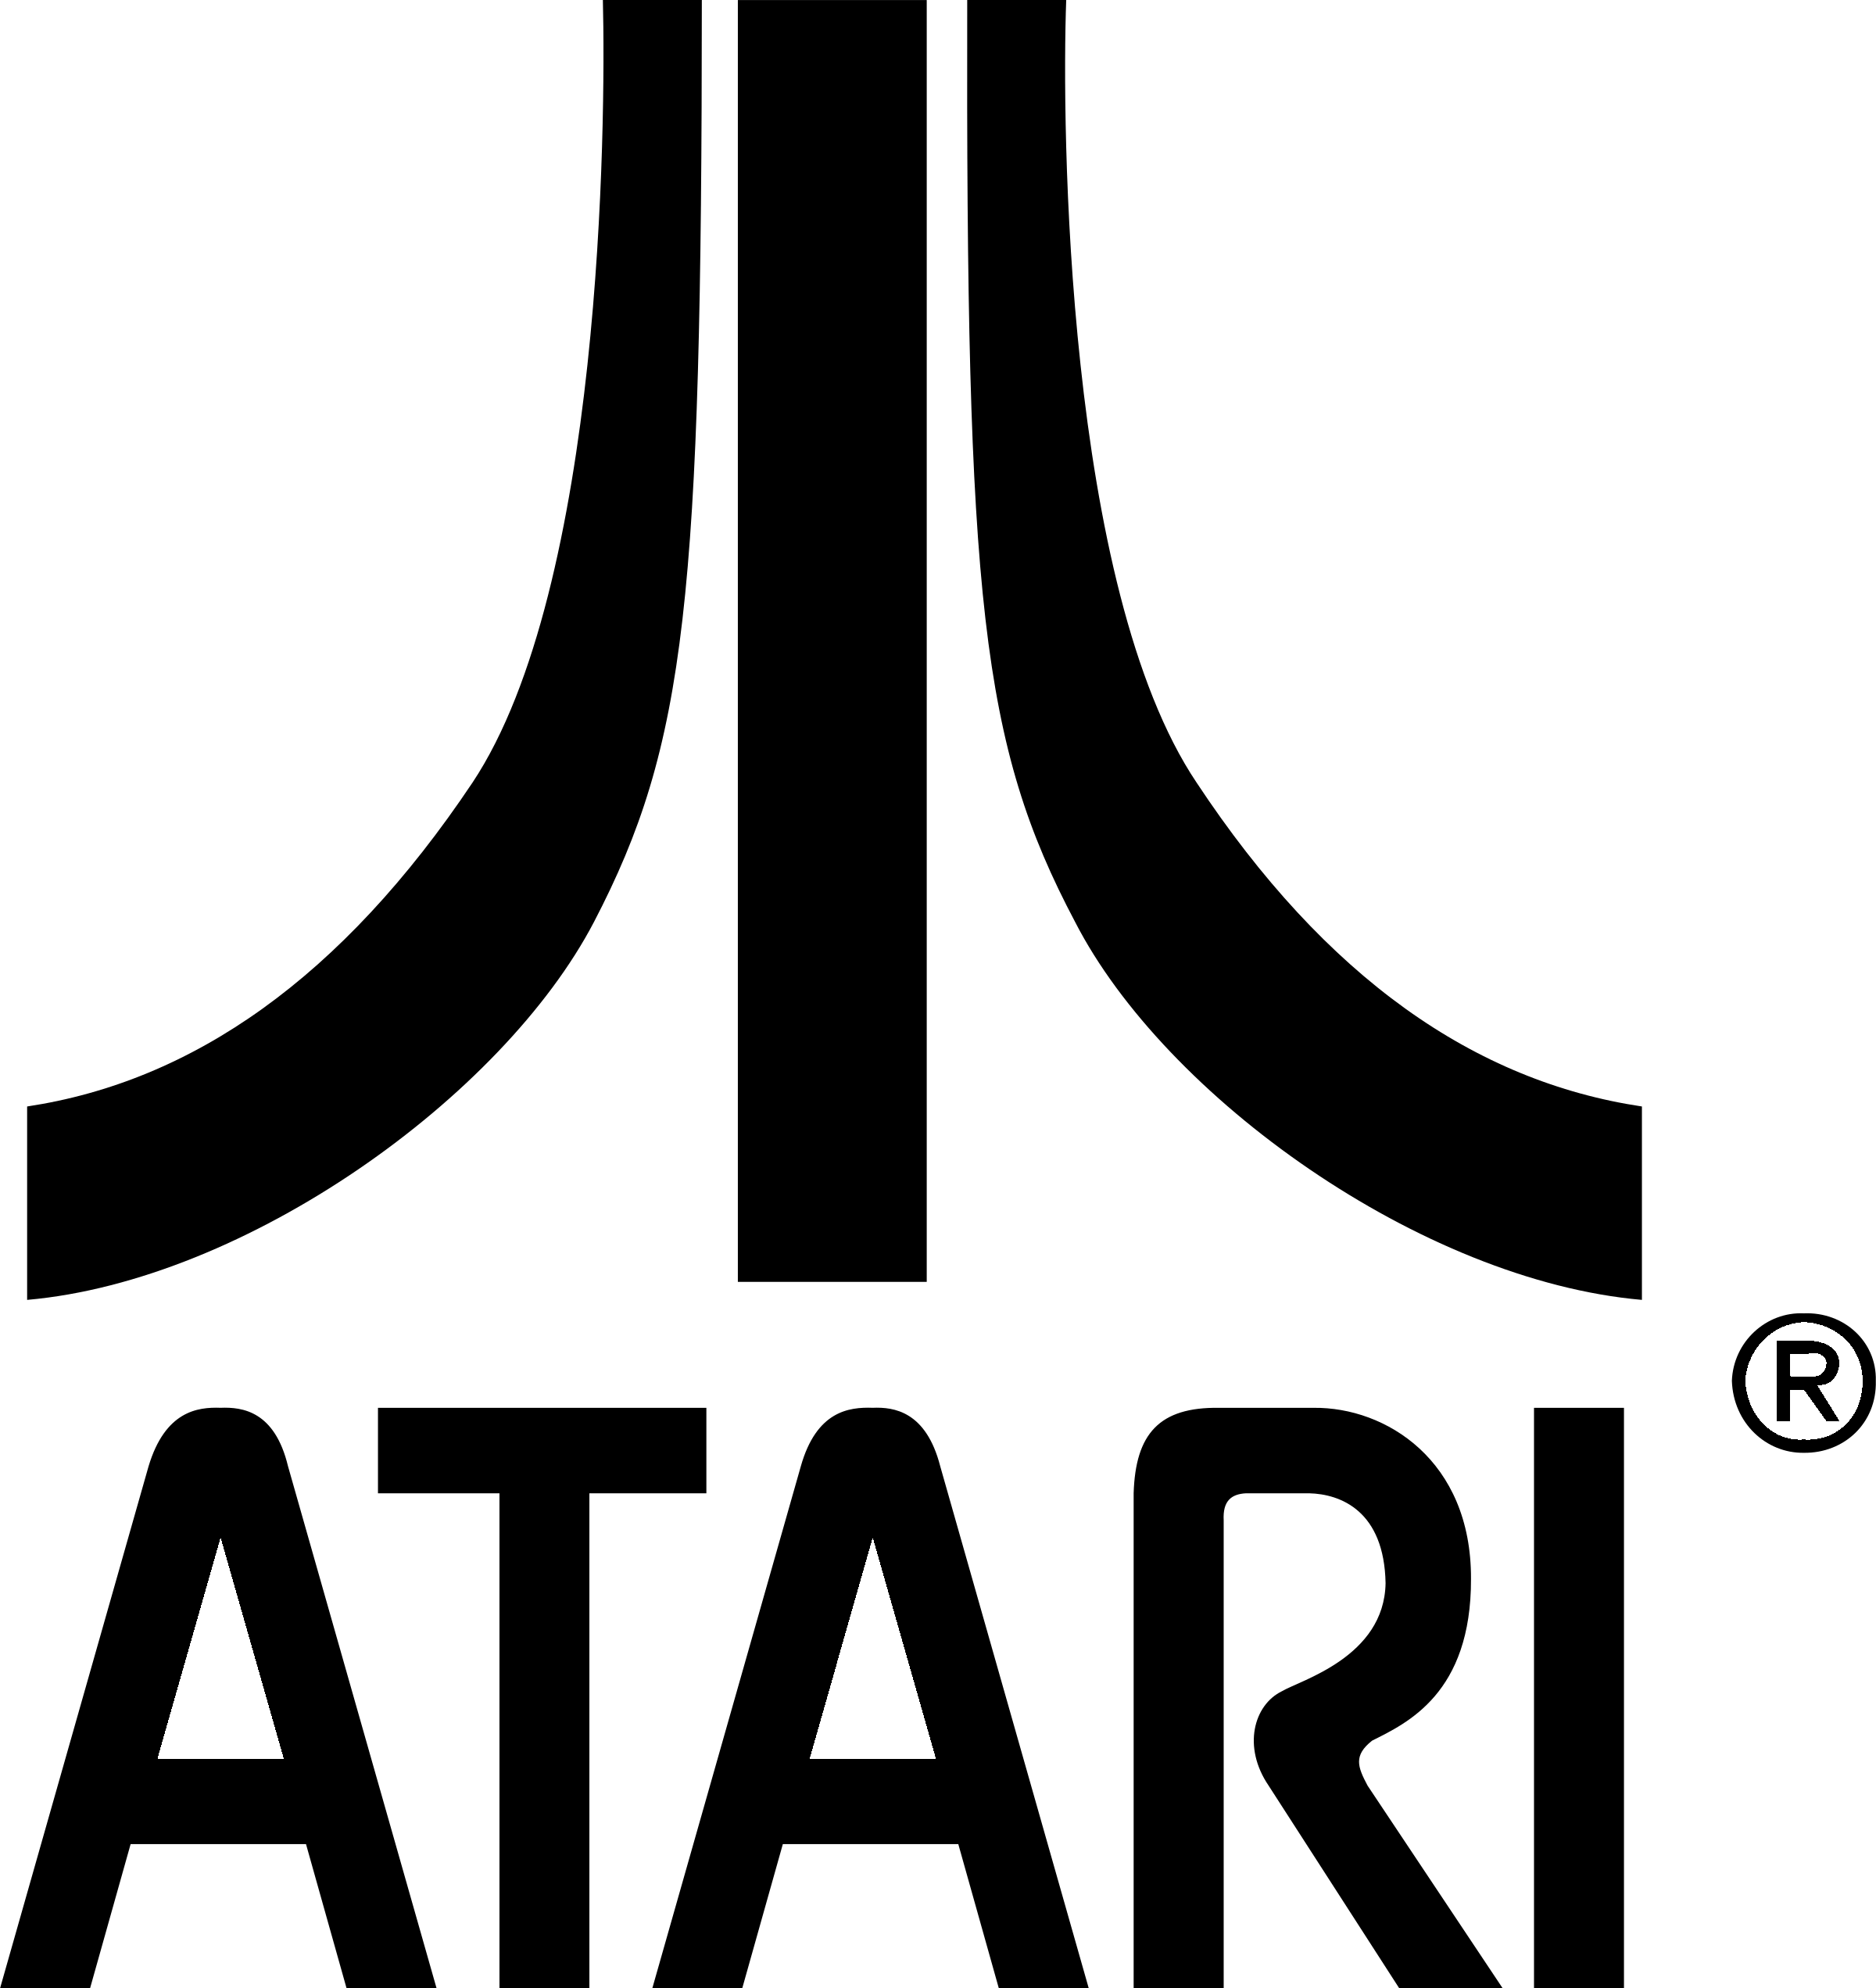 Atari Logo Black And White Atari Logo Game Logo Rainbow Logo